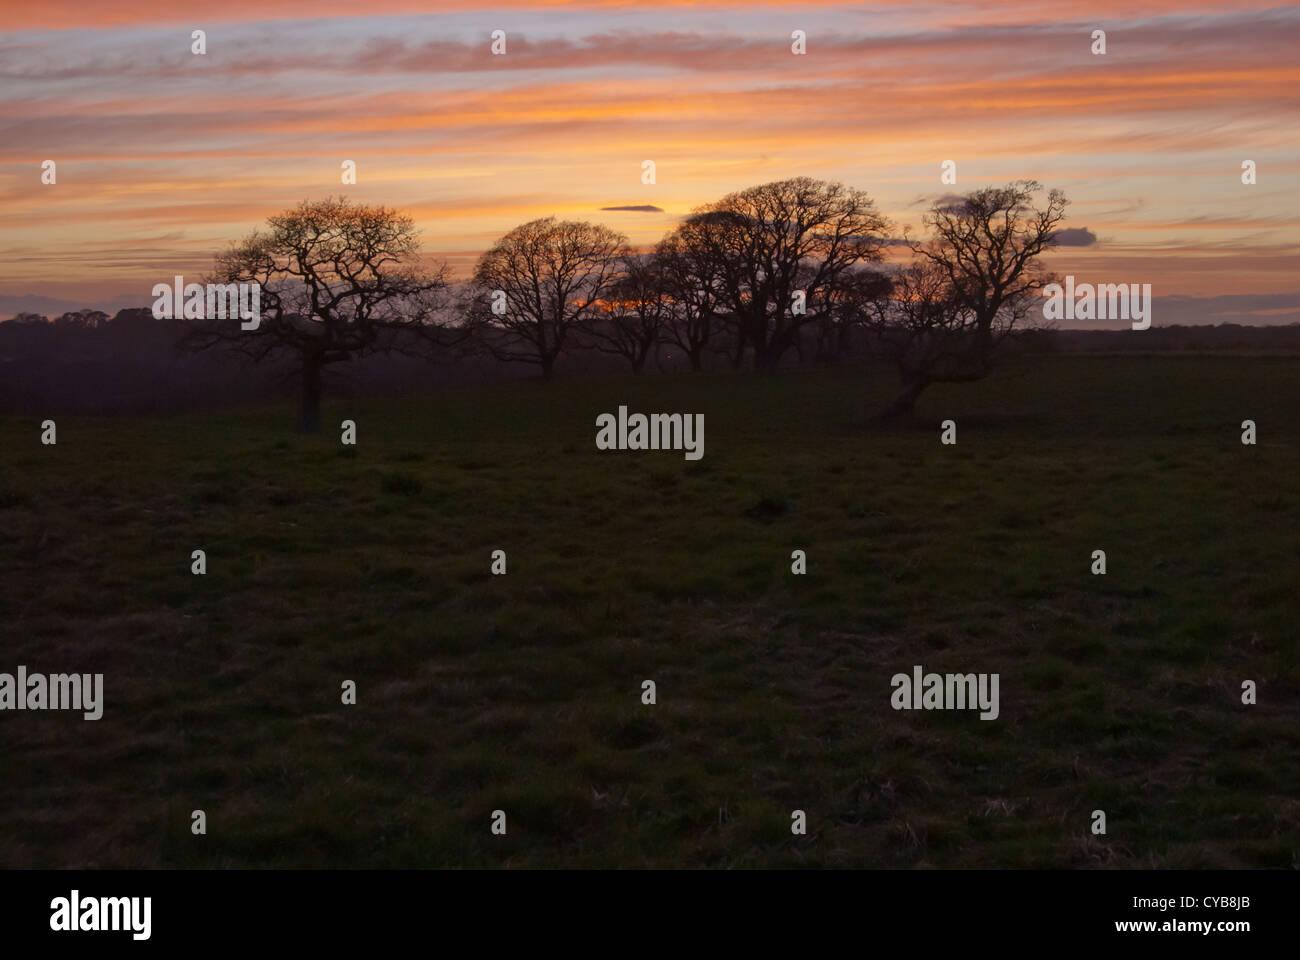 oak trees at sunset - Stock Image